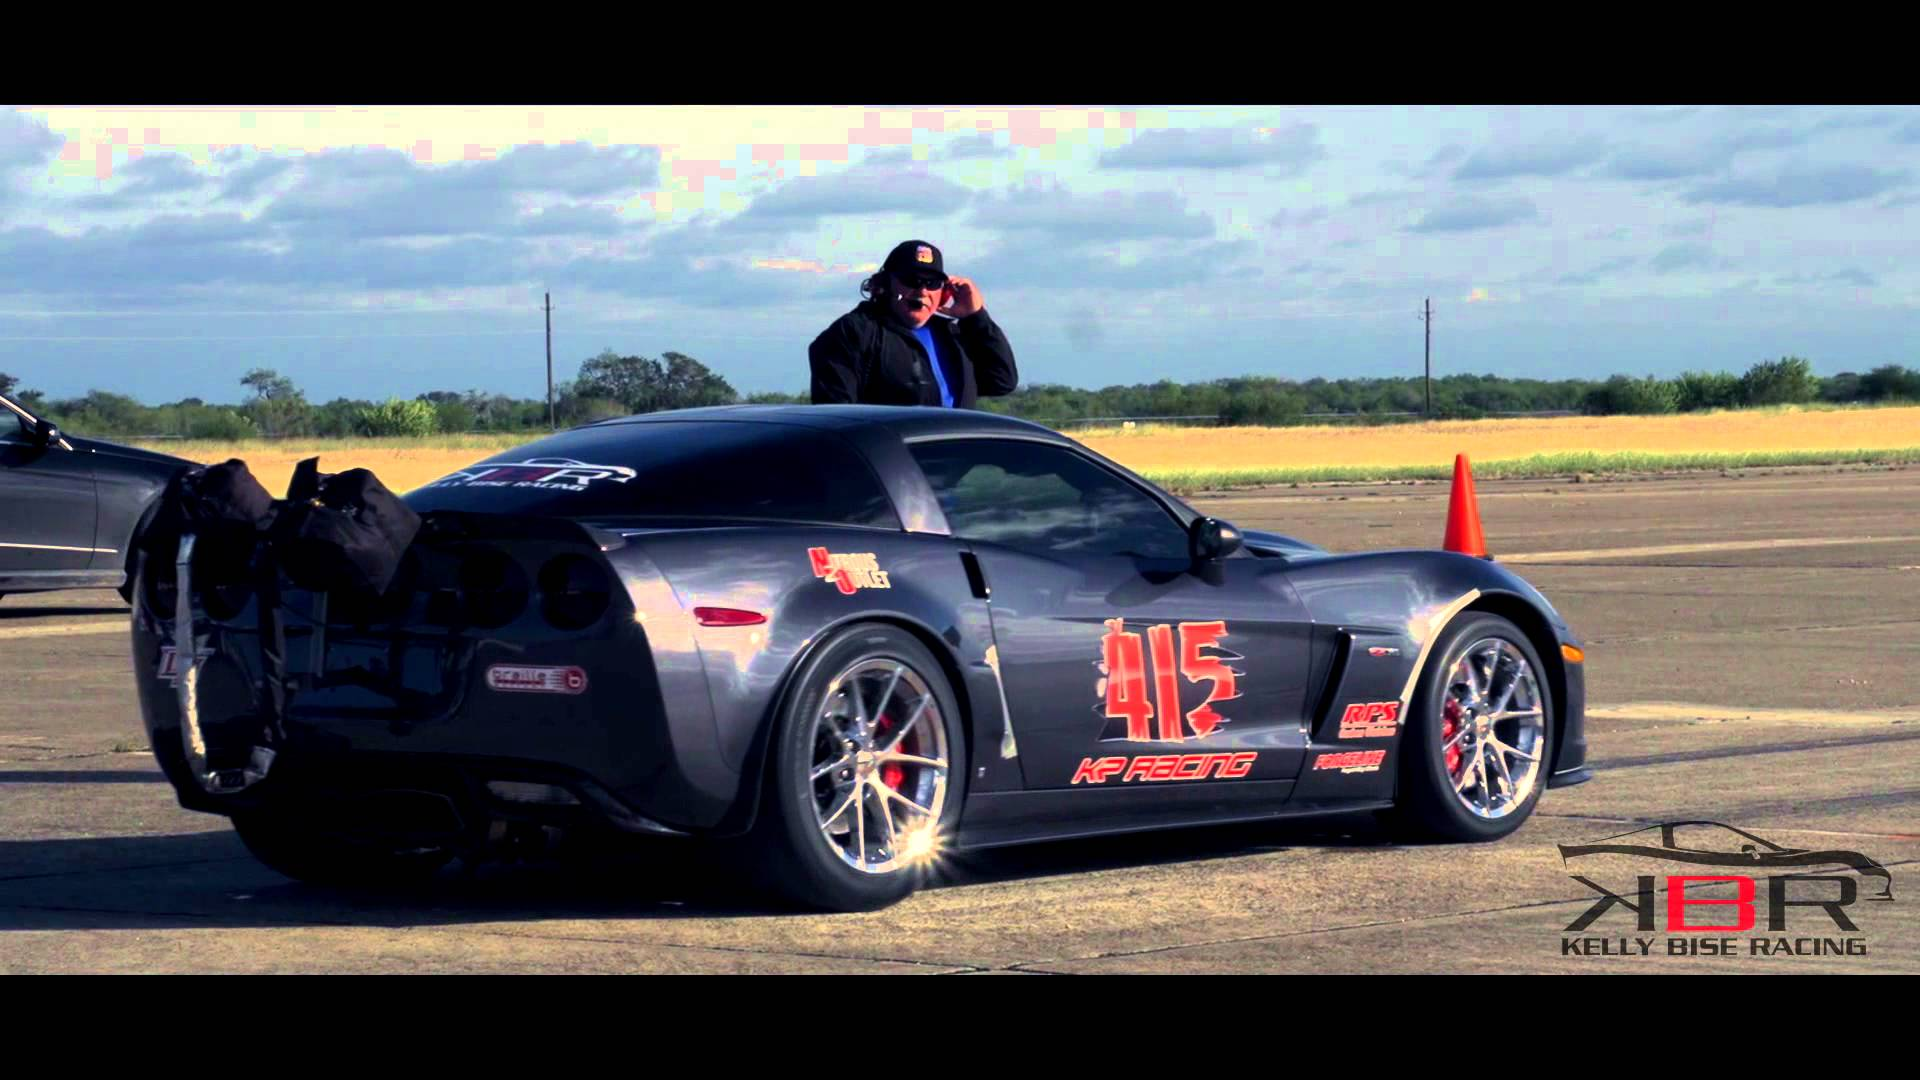 3,000 horsepower Z06 Corvette gets air at 190 mph